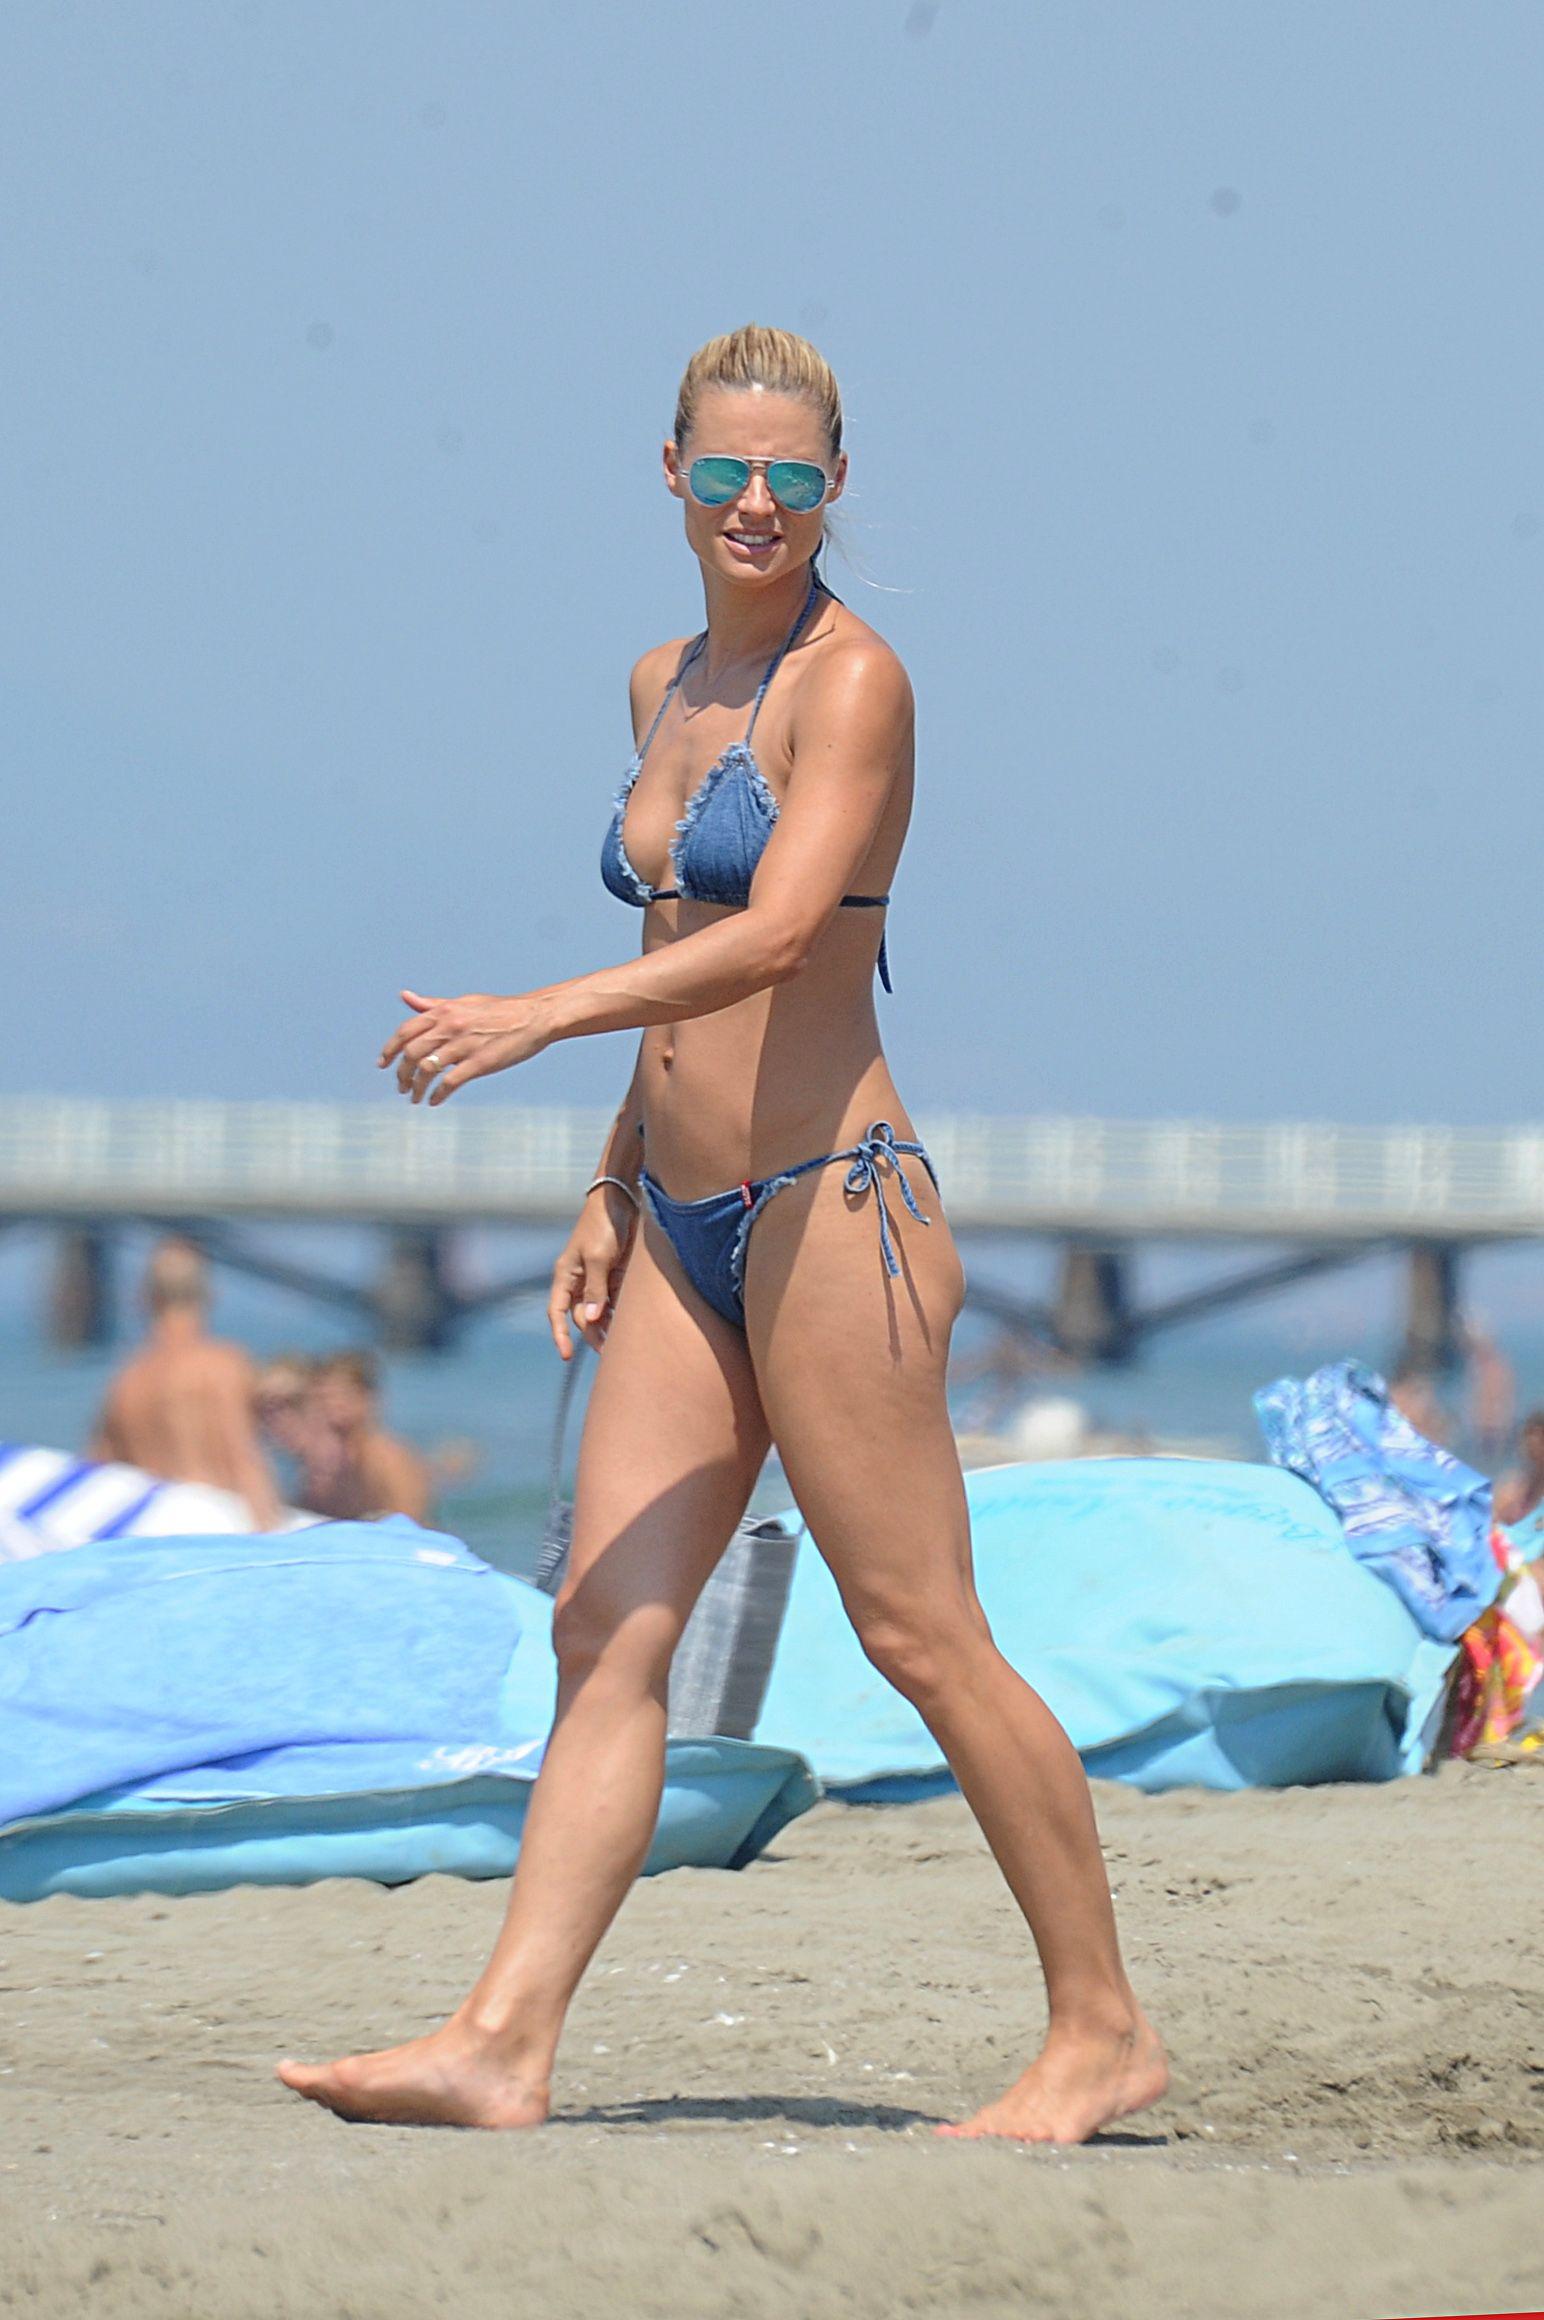 Michelle Hunziker in a Bikini (10 Photos)